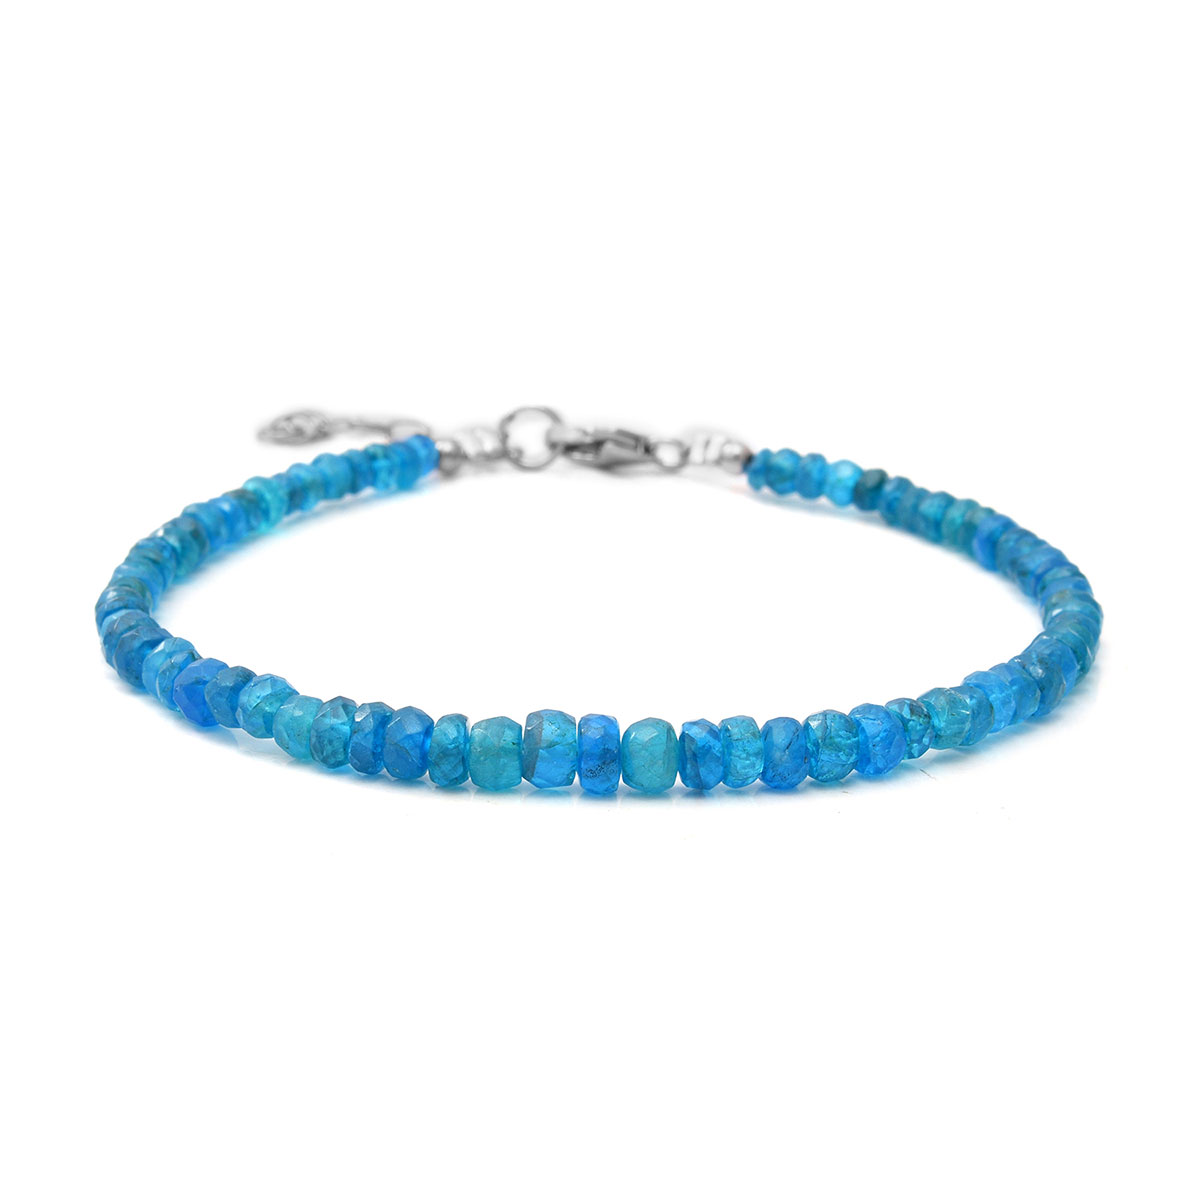 Cushion Rose Quartz Stretch Stretchable Bracelet for Women Gift Jewelry Ct 421